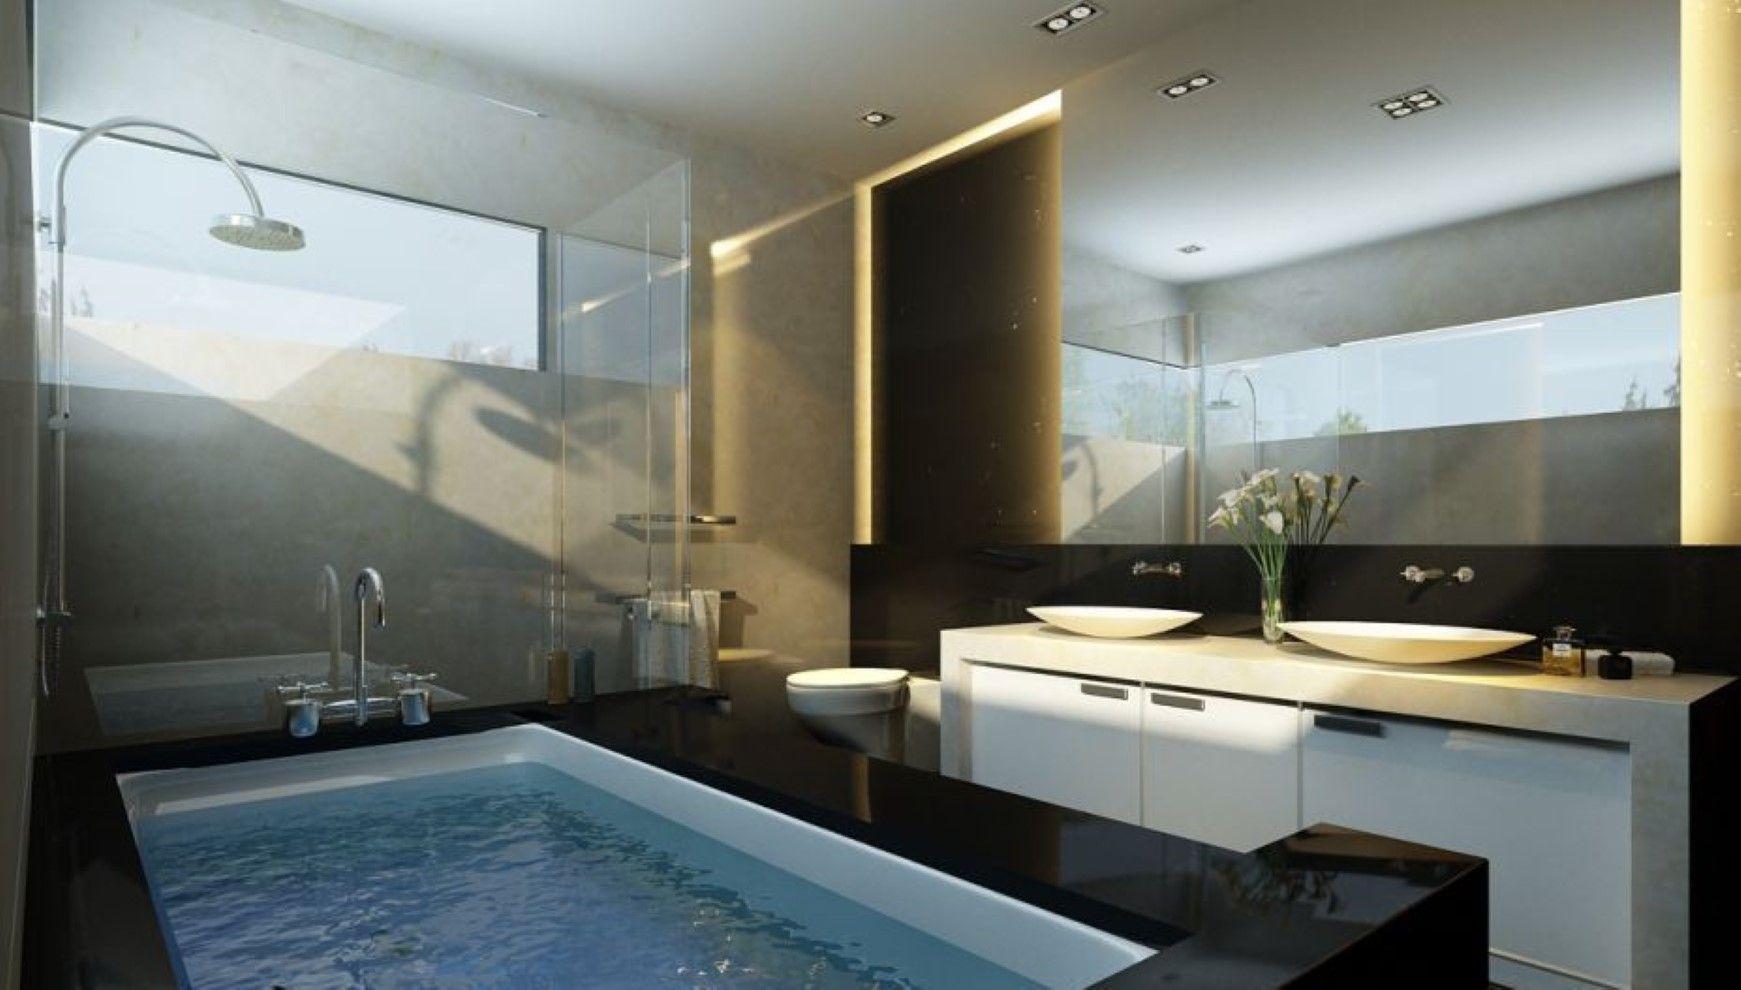 cool bathroom lighting. Innovative Tub Shower Combo Plus Cool Bathroom Lighting Idea And White Vanity Cabinet Furniture Amazing Bath Feel Along With Ideas L